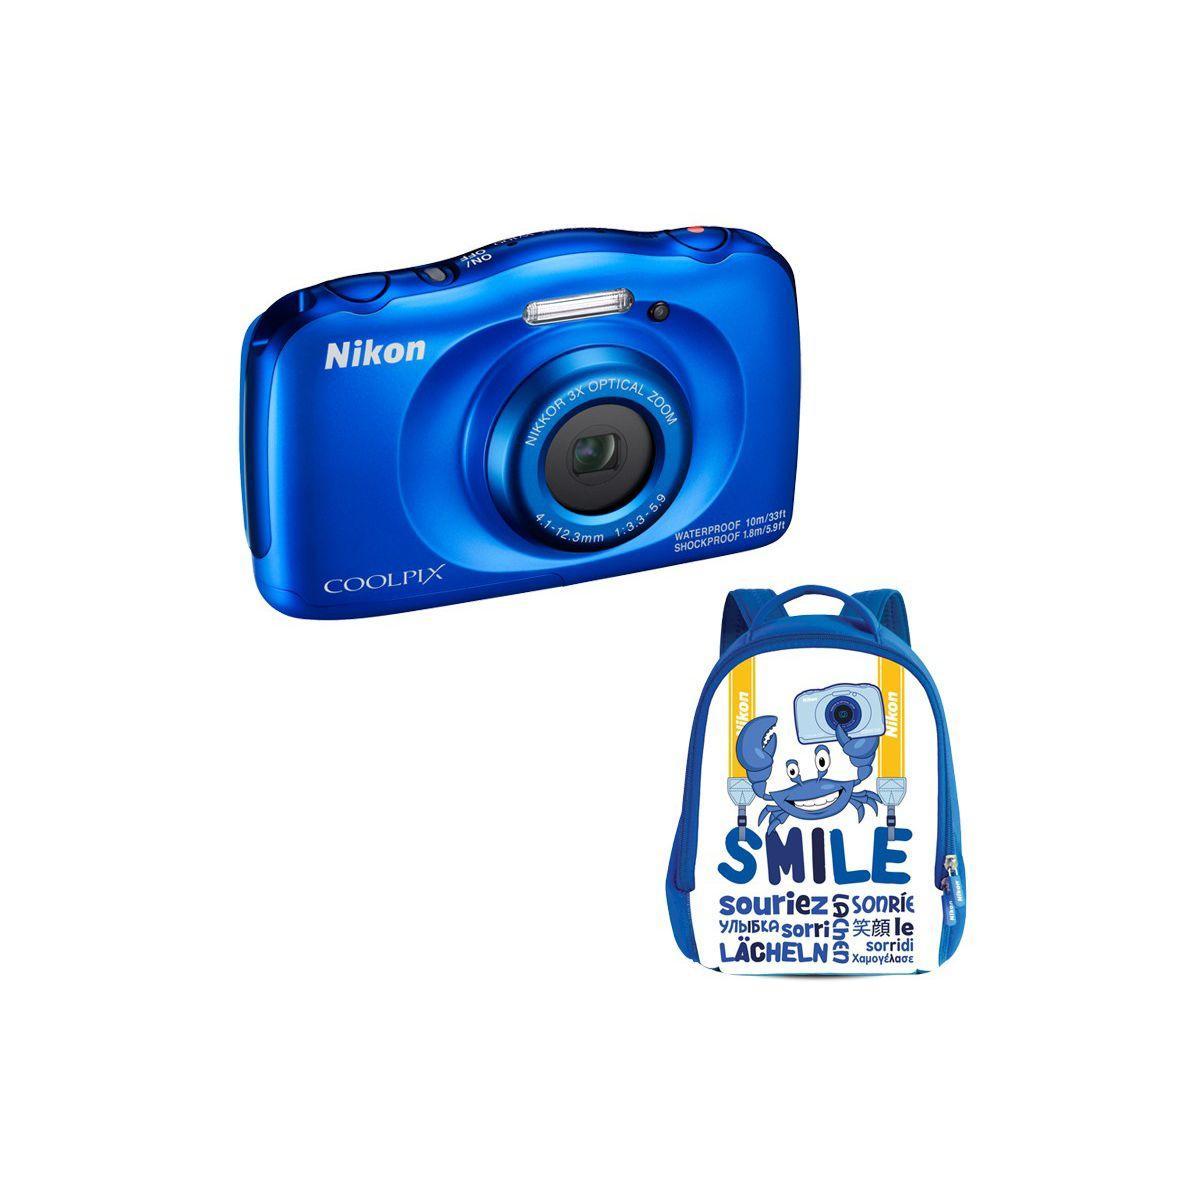 Appareil photo compact nikon coolpix w100 bleu + sac � dos (photo)